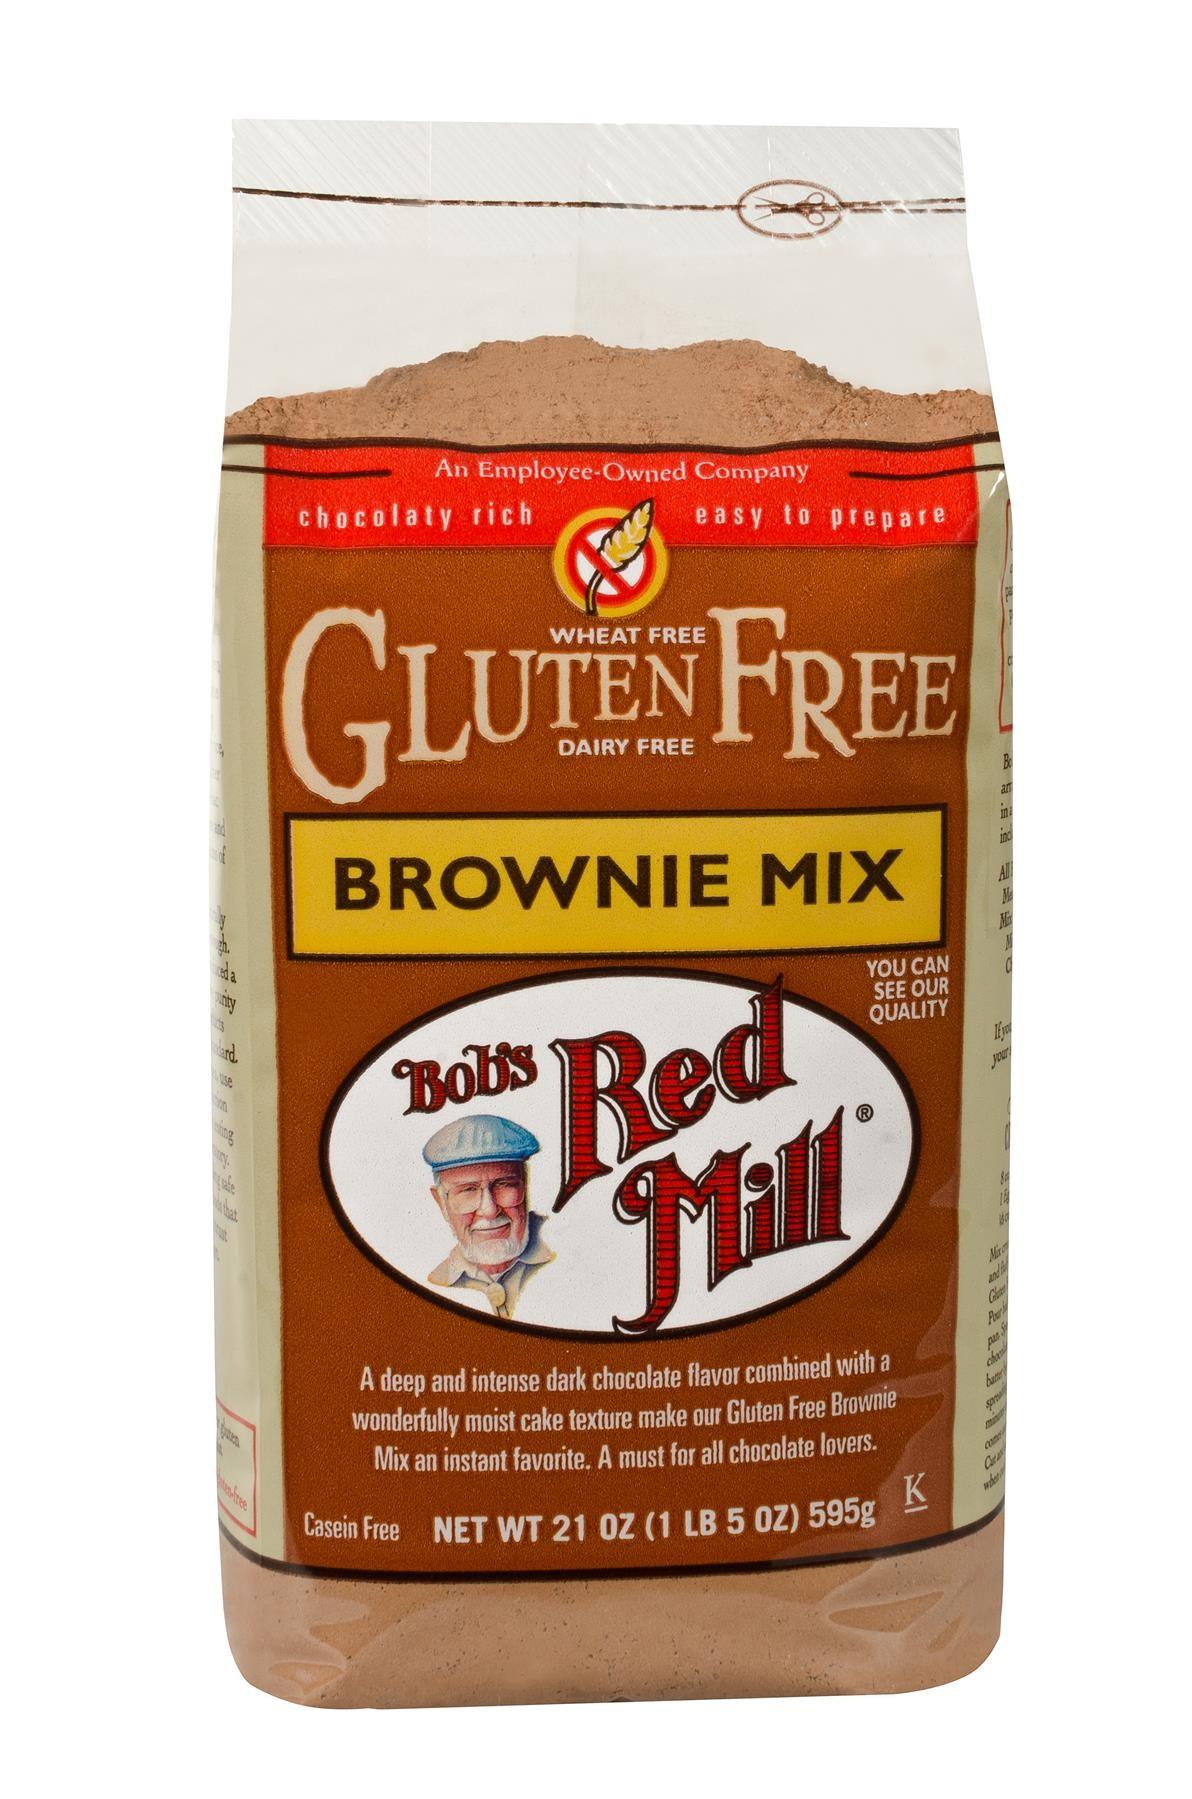 1612c214_glutenfree_browniemix_f_1800.jpg